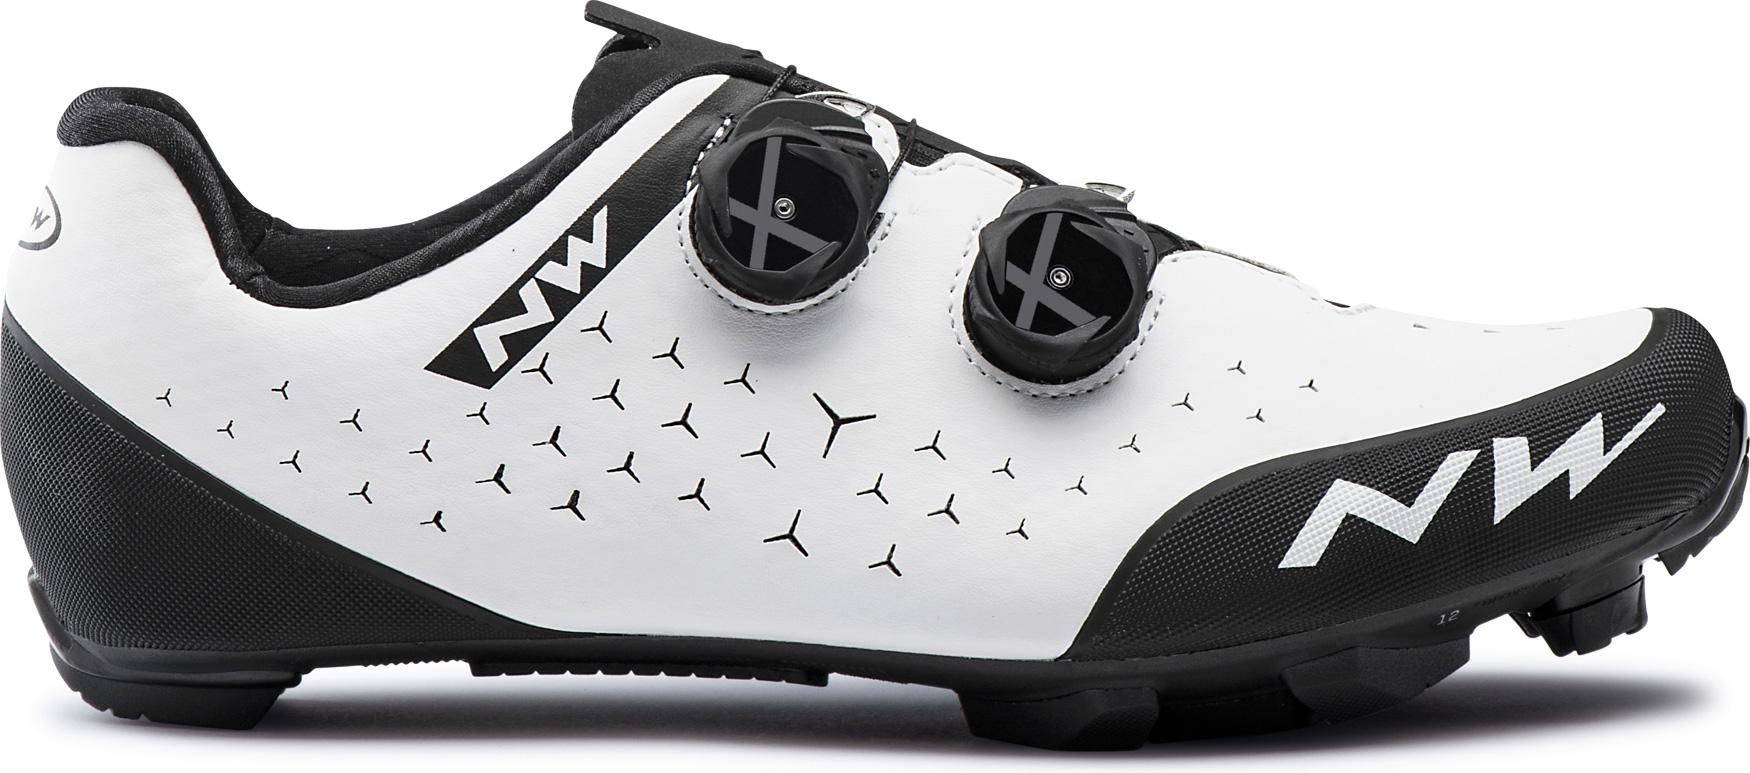 Northwave Rebel 2 MTB Schuhe - white/black 51